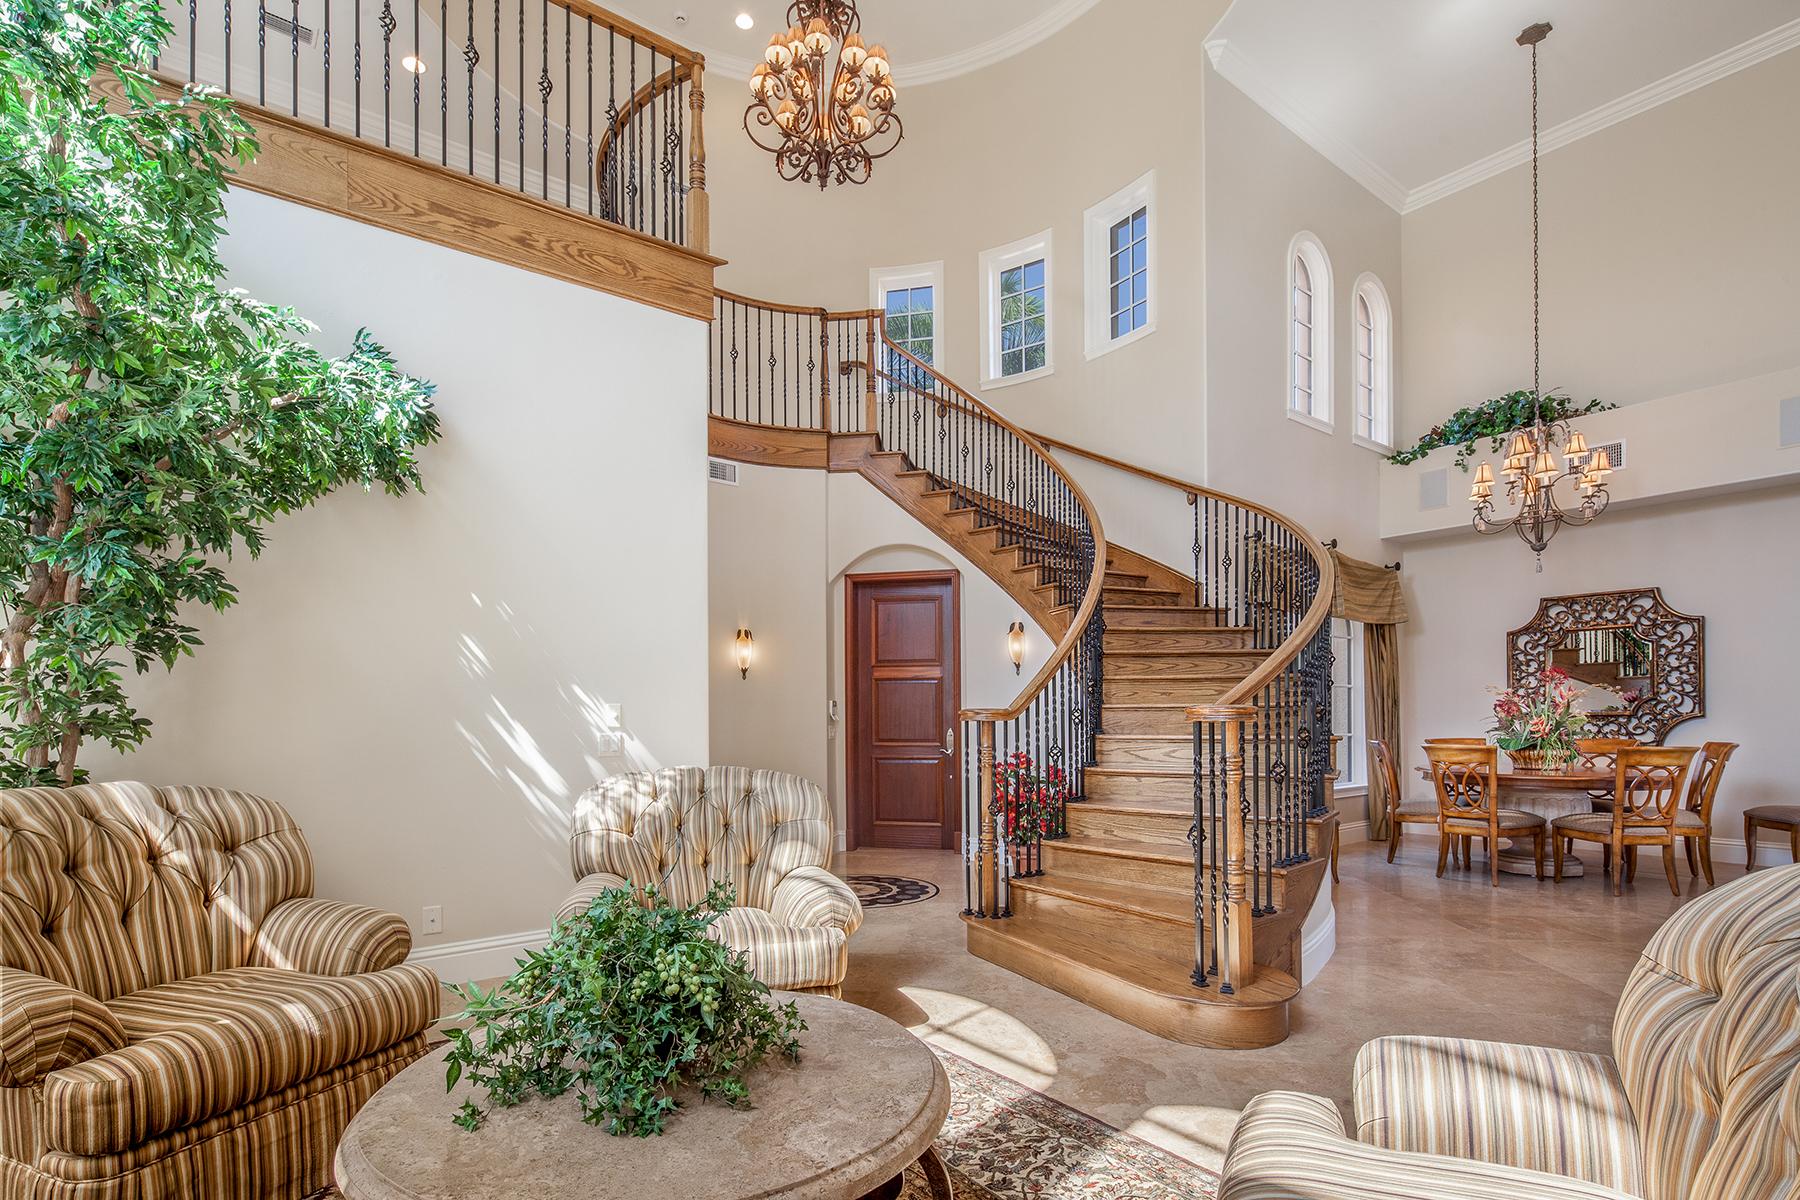 Additional photo for property listing at SERAFINA AT TIBURON 2970  Tiburon Blvd  E,  Naples, Florida 34109 United States